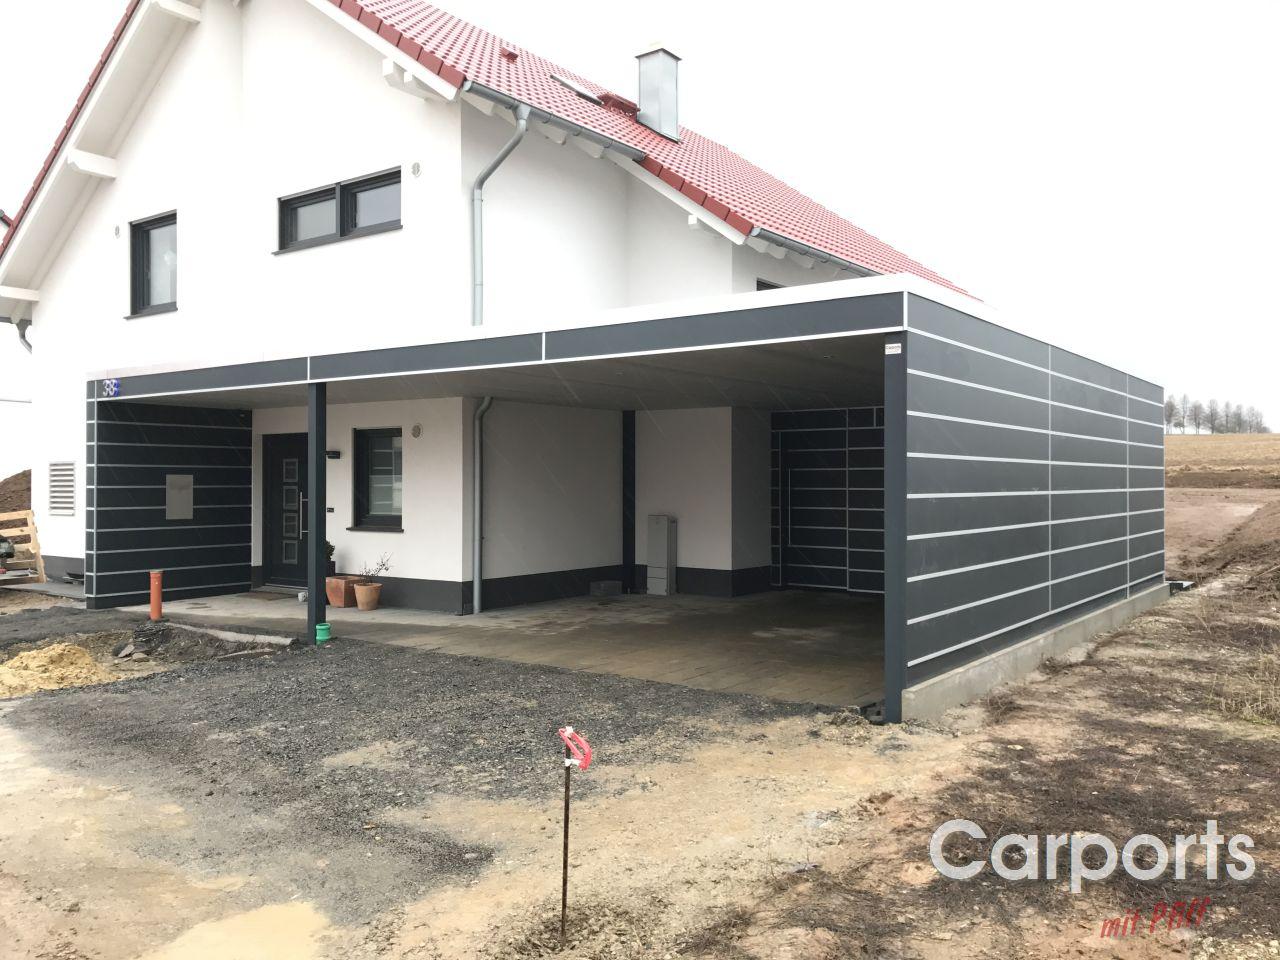 Carport Bauhaus Hpl Mit Abstellraum Und Haust 252 R 252 Berdachung